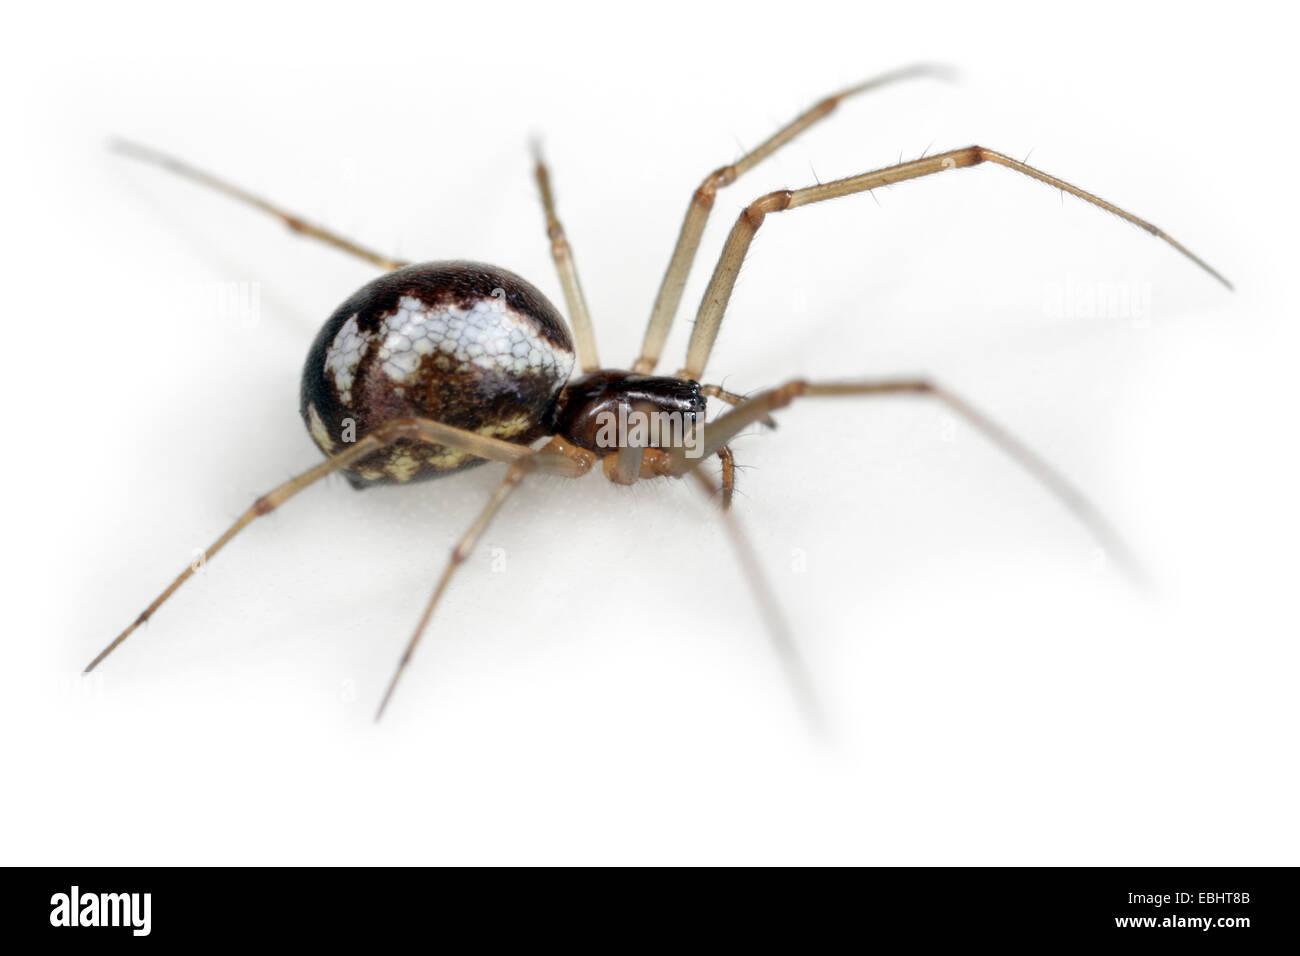 Female Neriene peltata spider on white background, Family Linyphiidae, Sheetweb weavers. Stock Photo